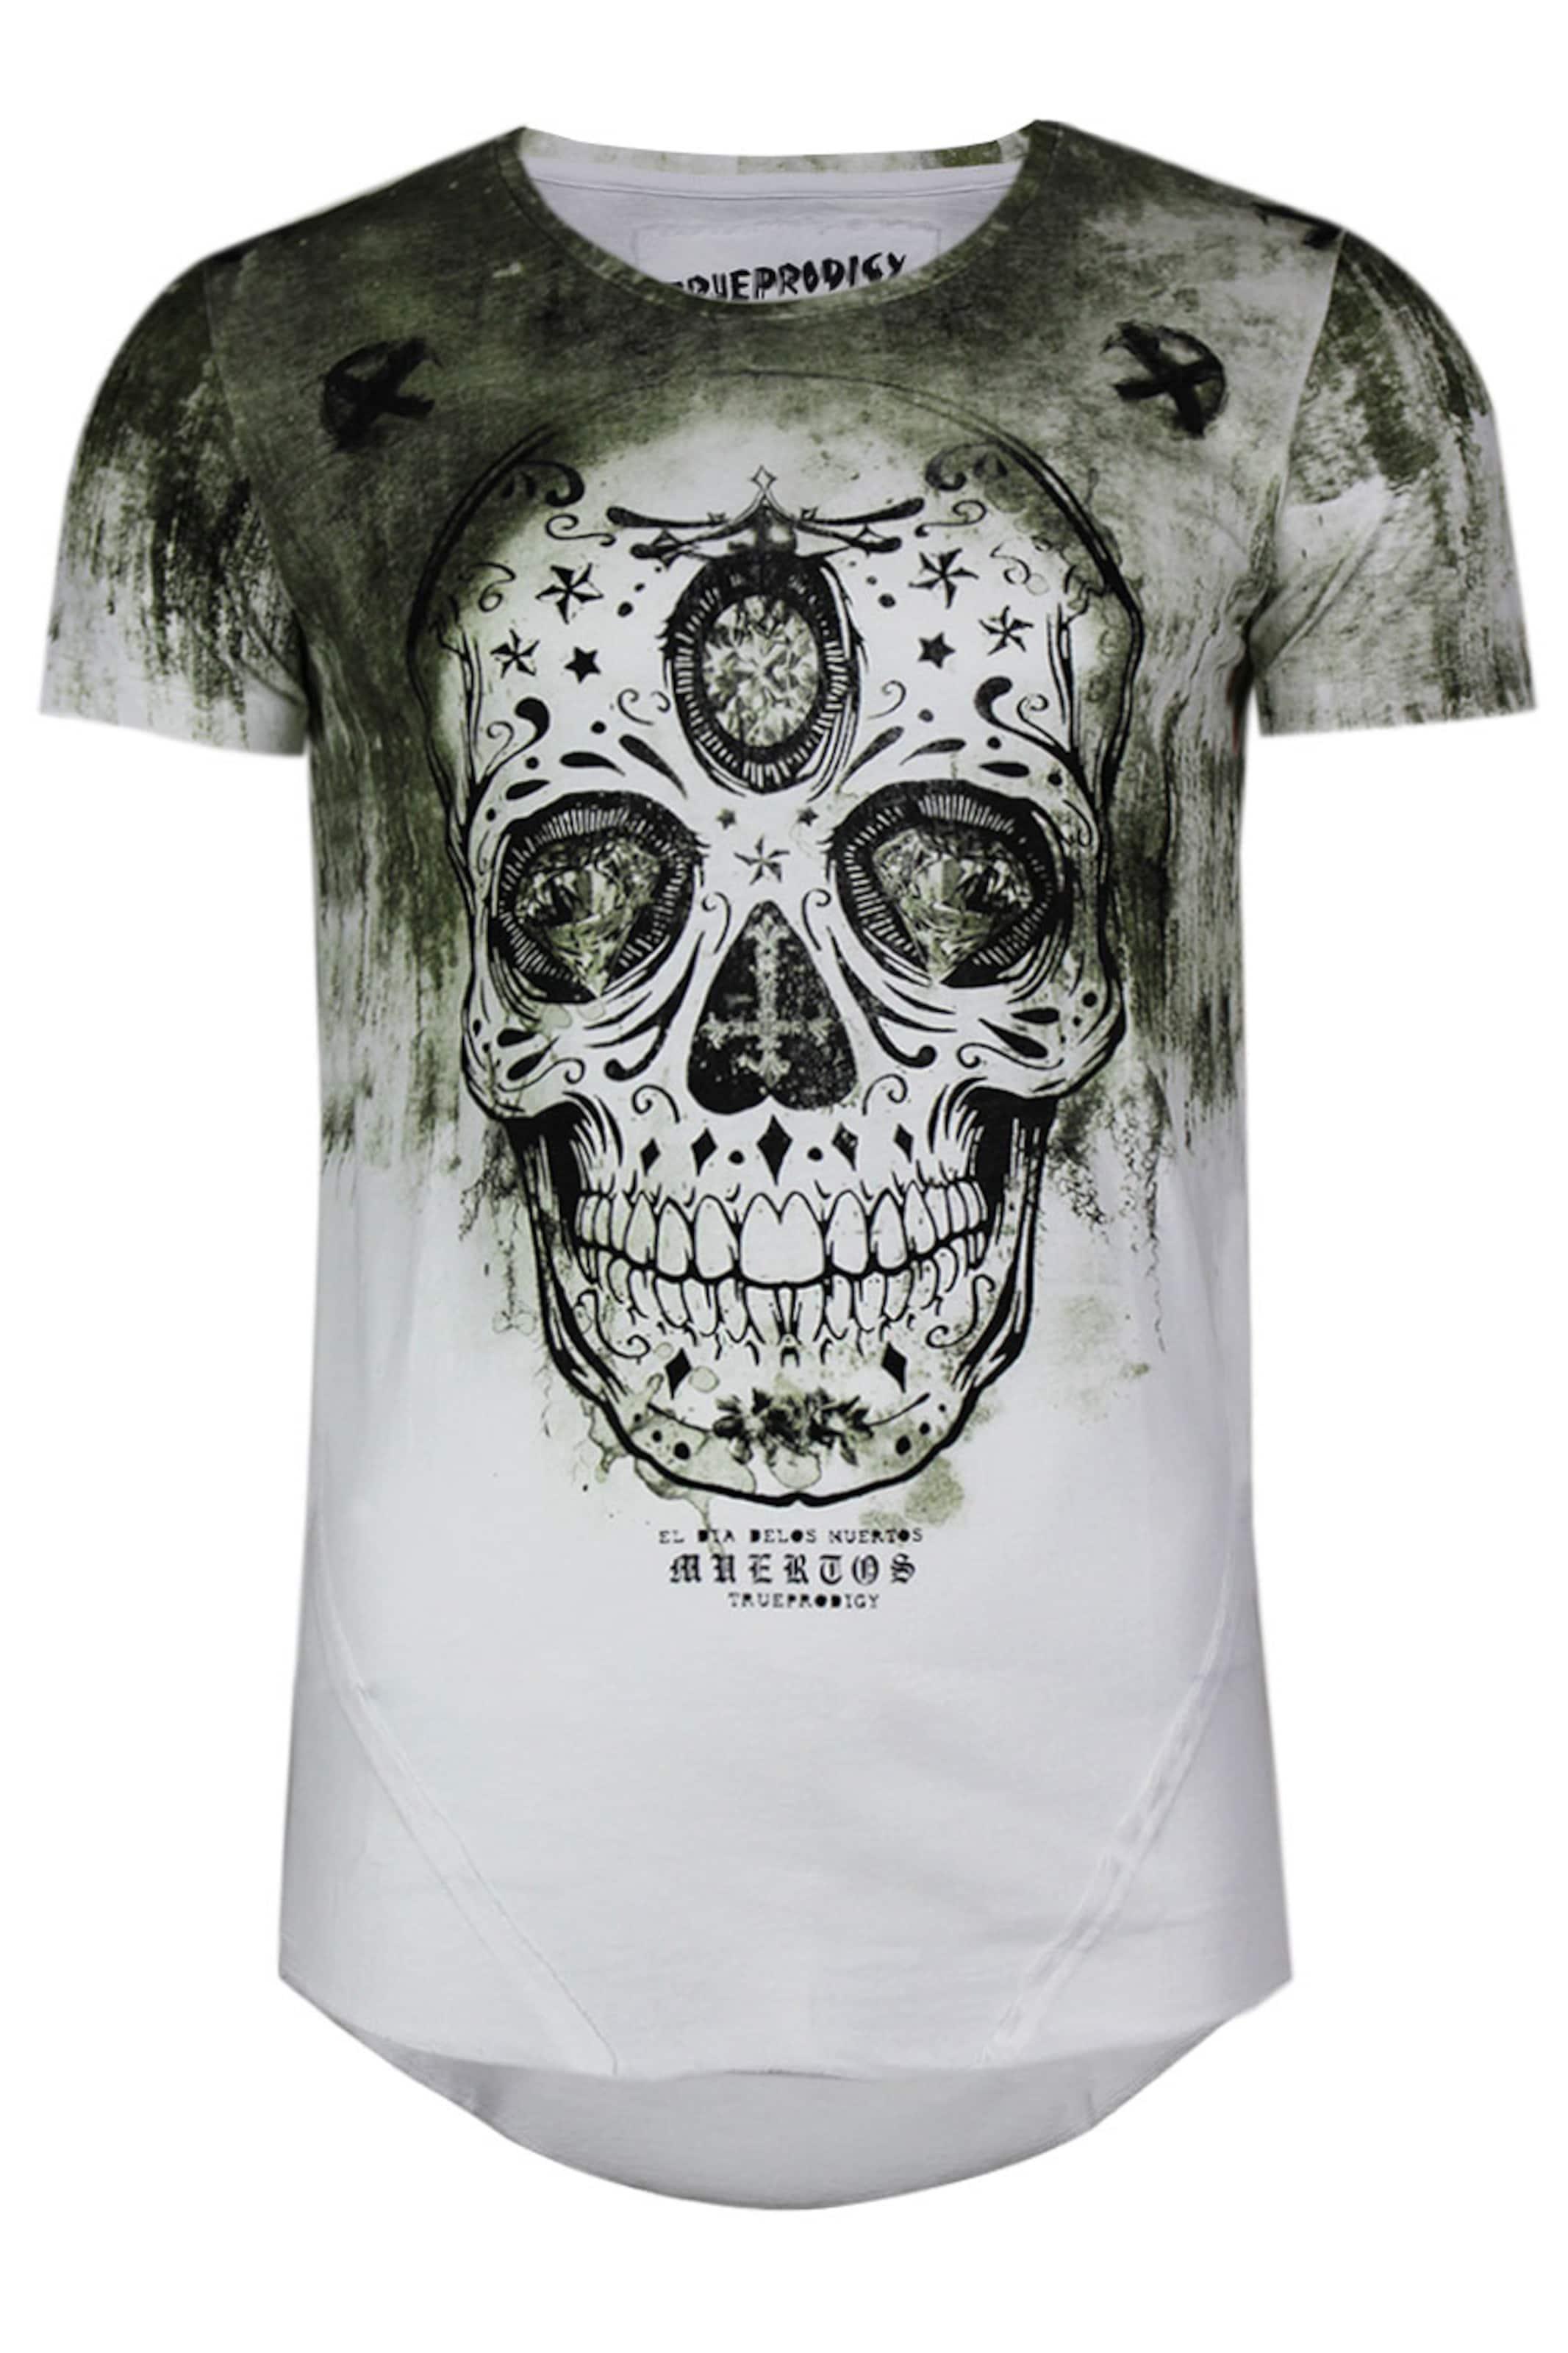 Dead T In Trueprodigy shirt 'festival The KhakiWeiß Of Ii' Ybf6y7g